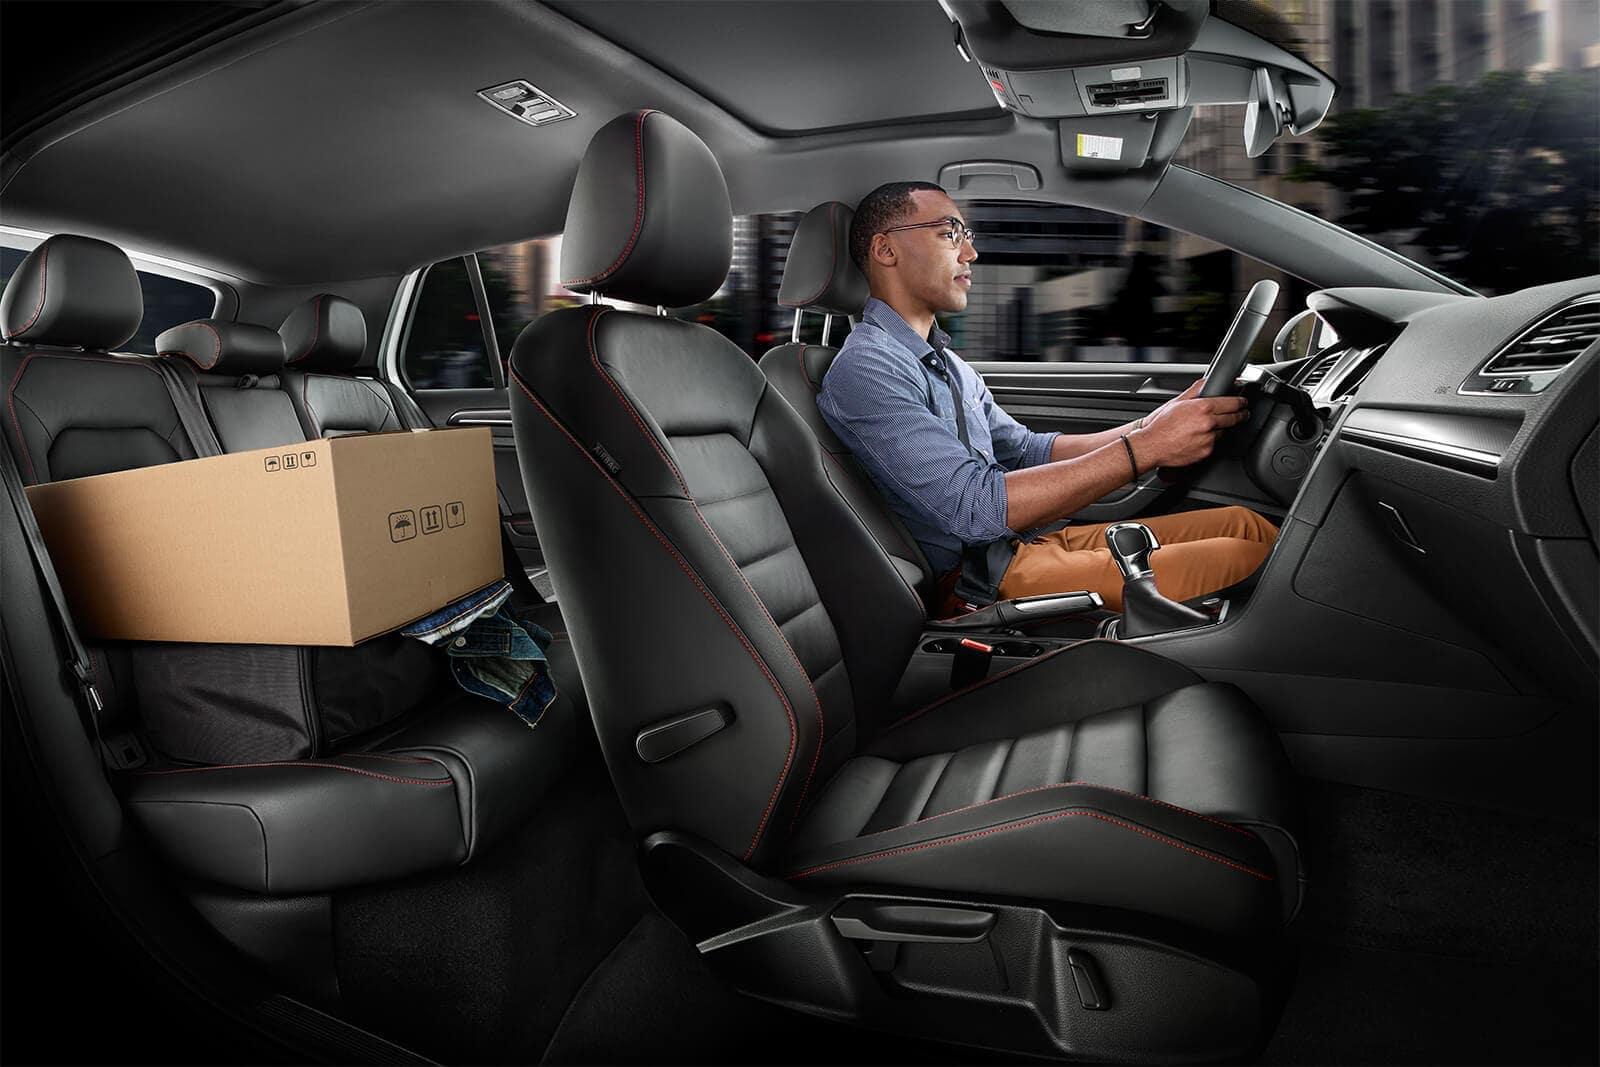 2019 VW Golf GTI interior